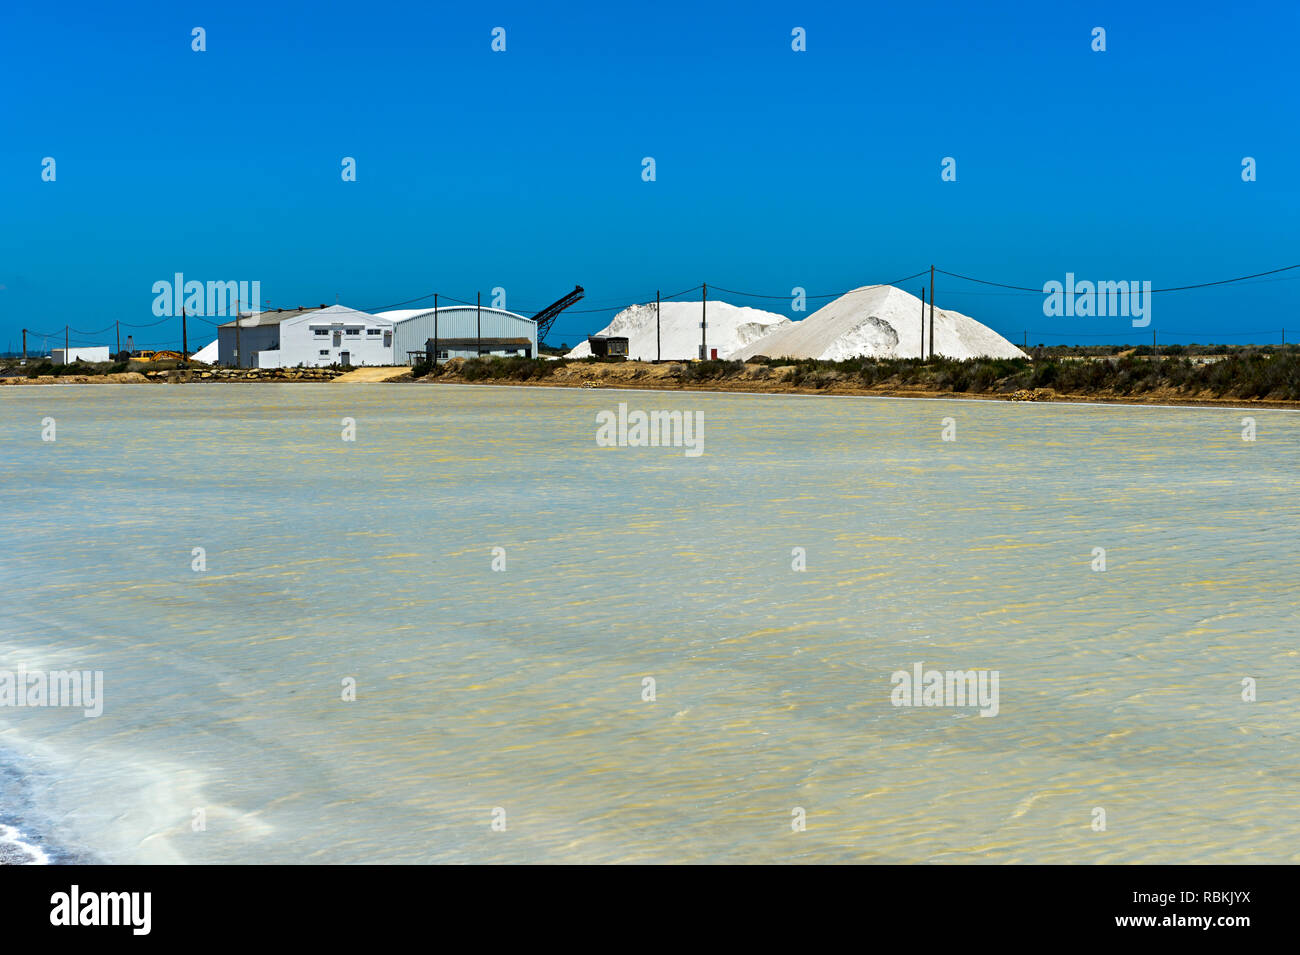 Meersalz, Salz Verdunstungsteichen, Sopursal Kochsalzlösung, Santa Luzia, Algarve, Portugal Stockfoto